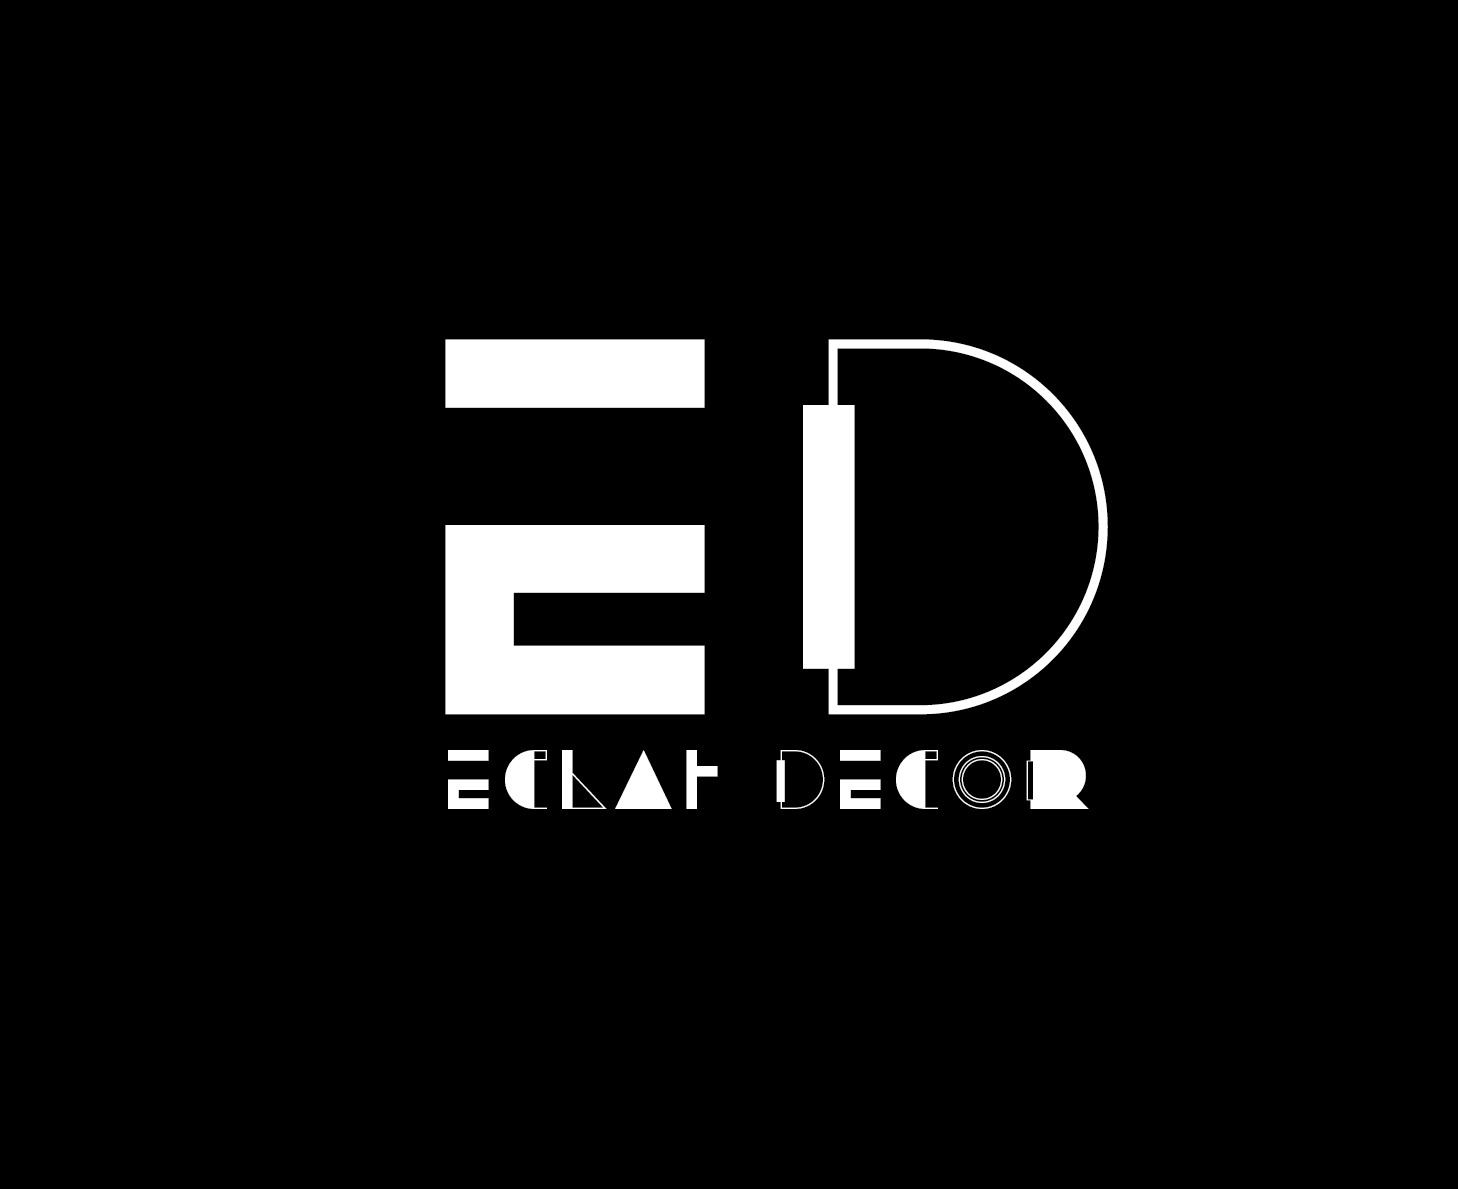 Logo Design by VENTSISLAV KOVACHEV - Entry No. 5 in the Logo Design Contest Imaginative Logo Design for Éclat Decor.